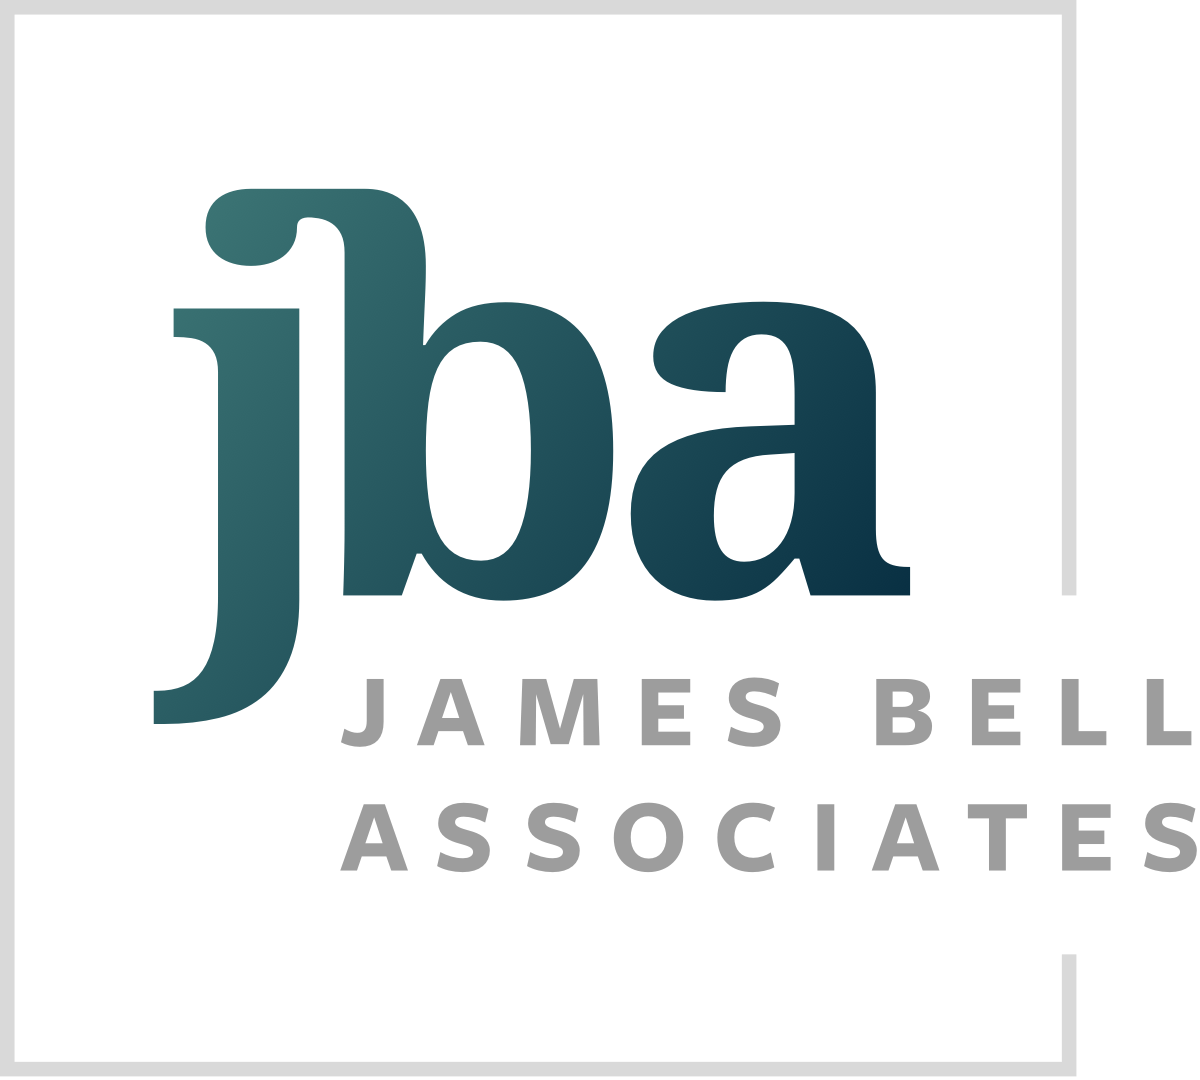 Careers - James Bell Associates : James Bell Associates